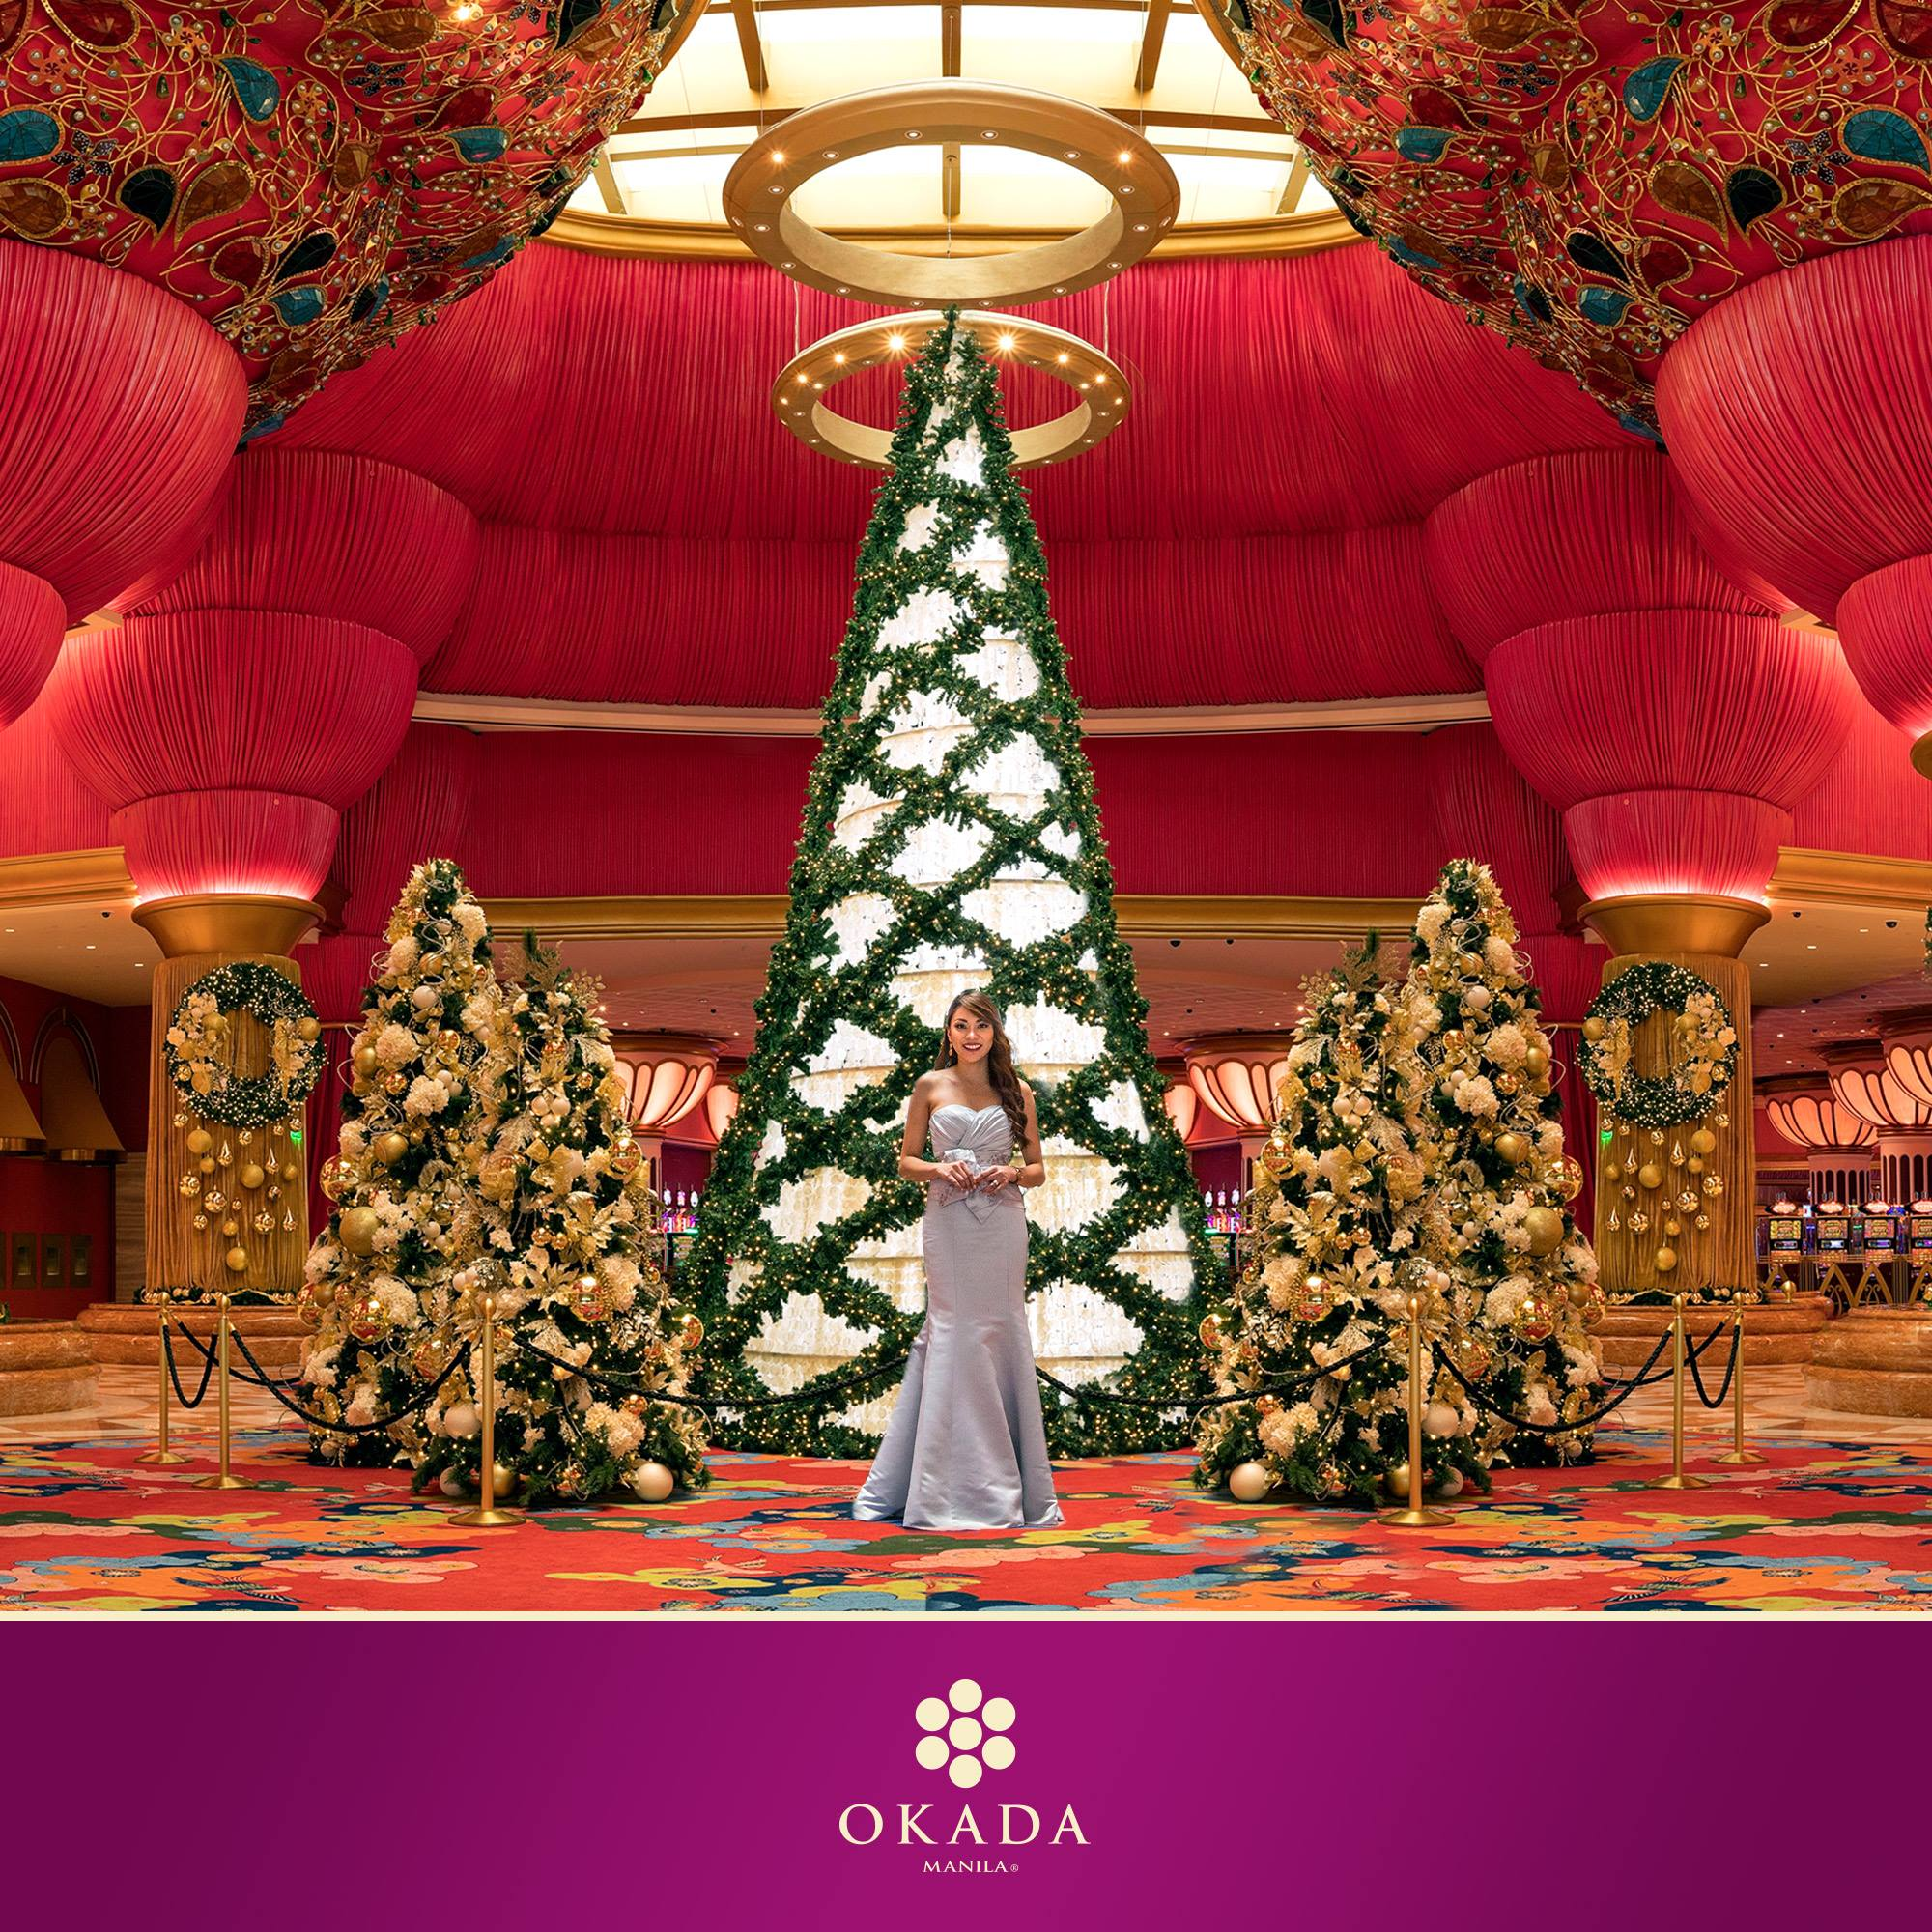 OKADA MANILA. The hotel's tree is not your usual Christmas tree. Photo from Facebook.com/OkadaManilaPH